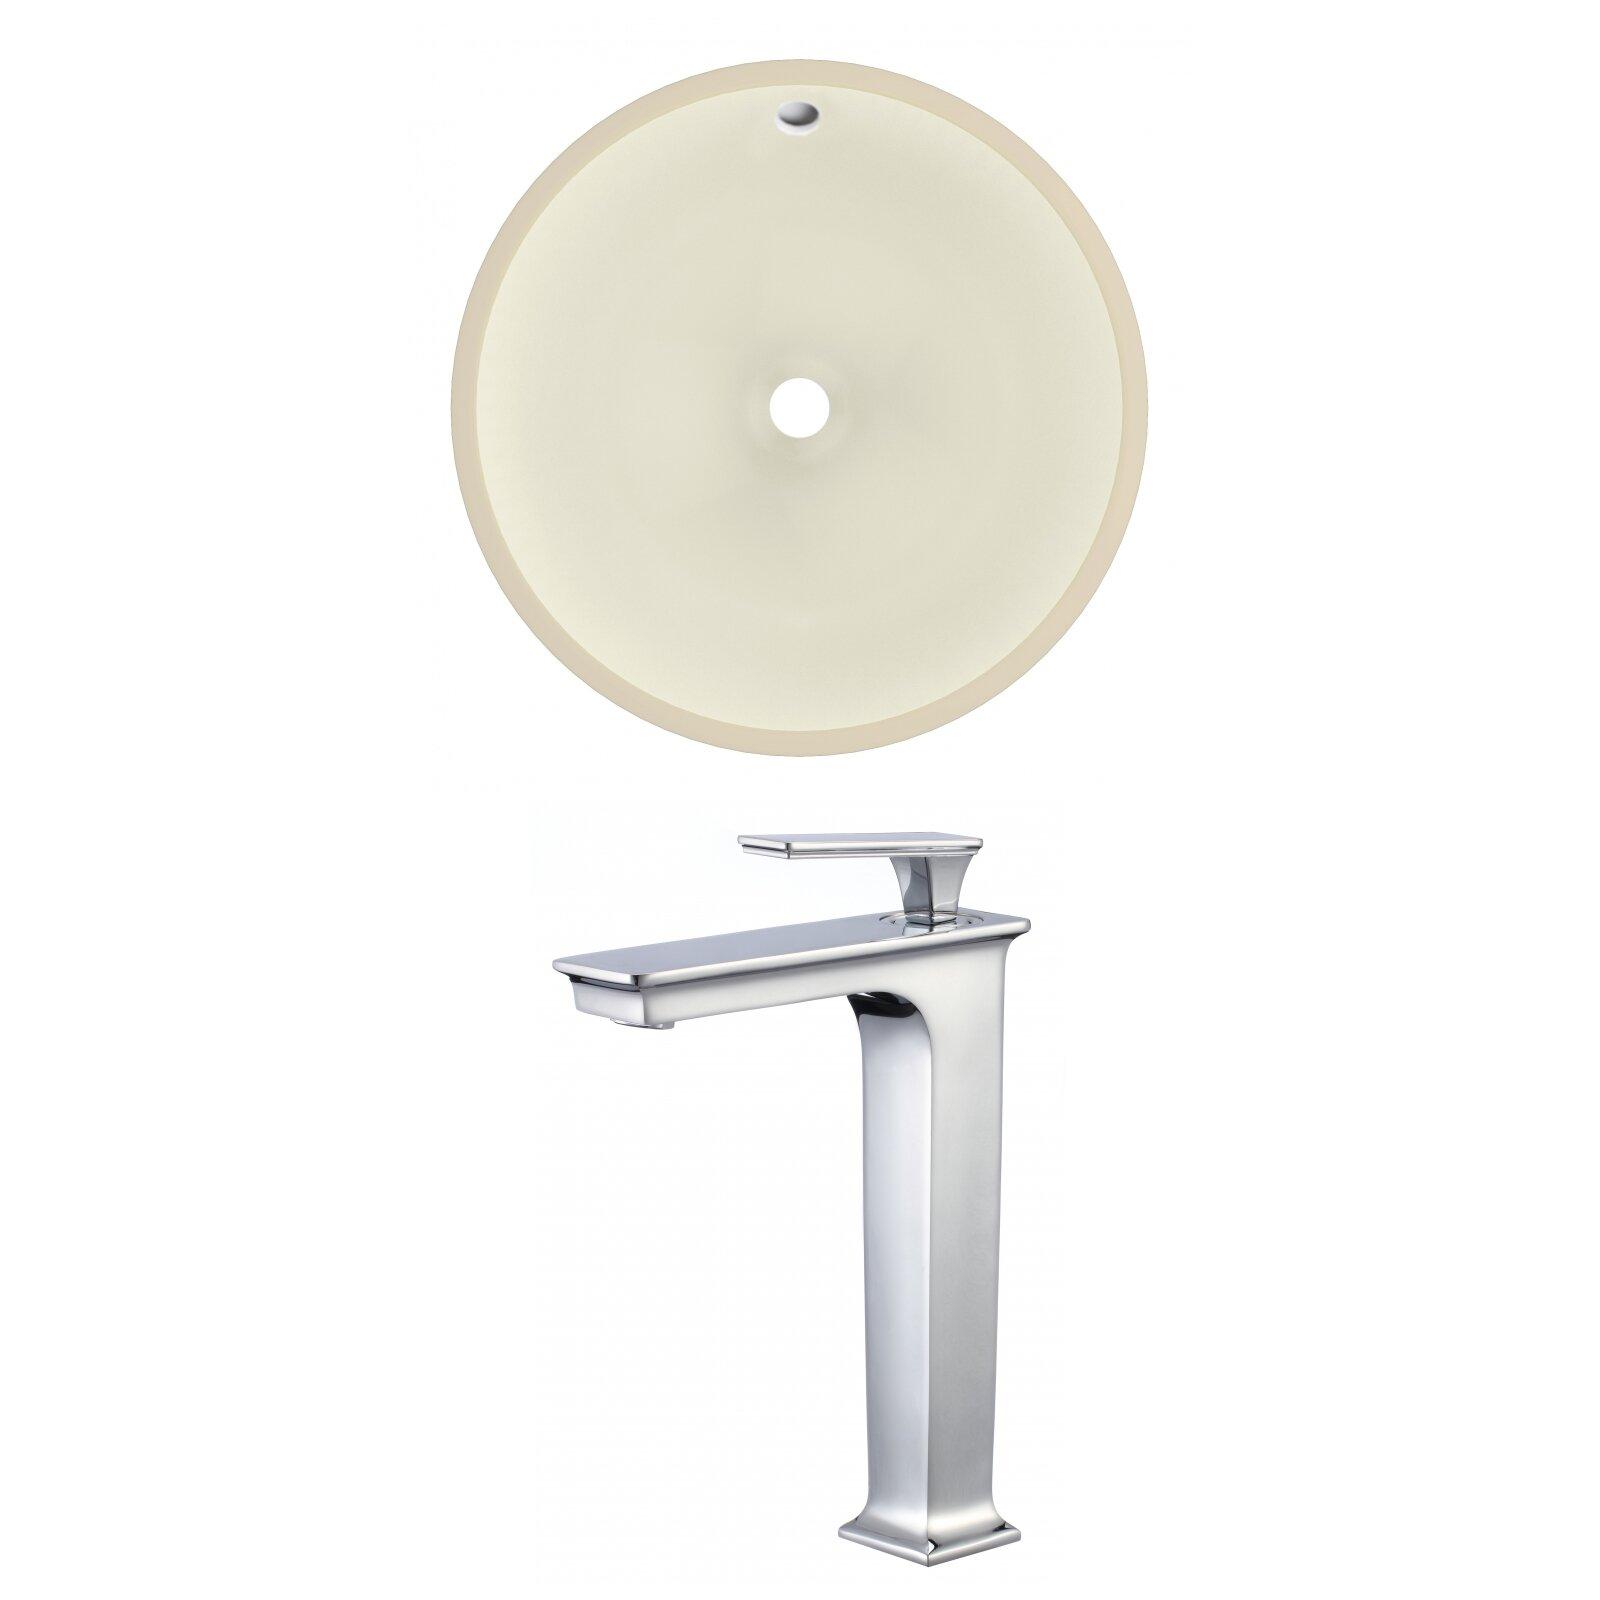 Avanities Ceramic Circular Undermount Bathroom Sink With Overflow And Faucet Wayfair